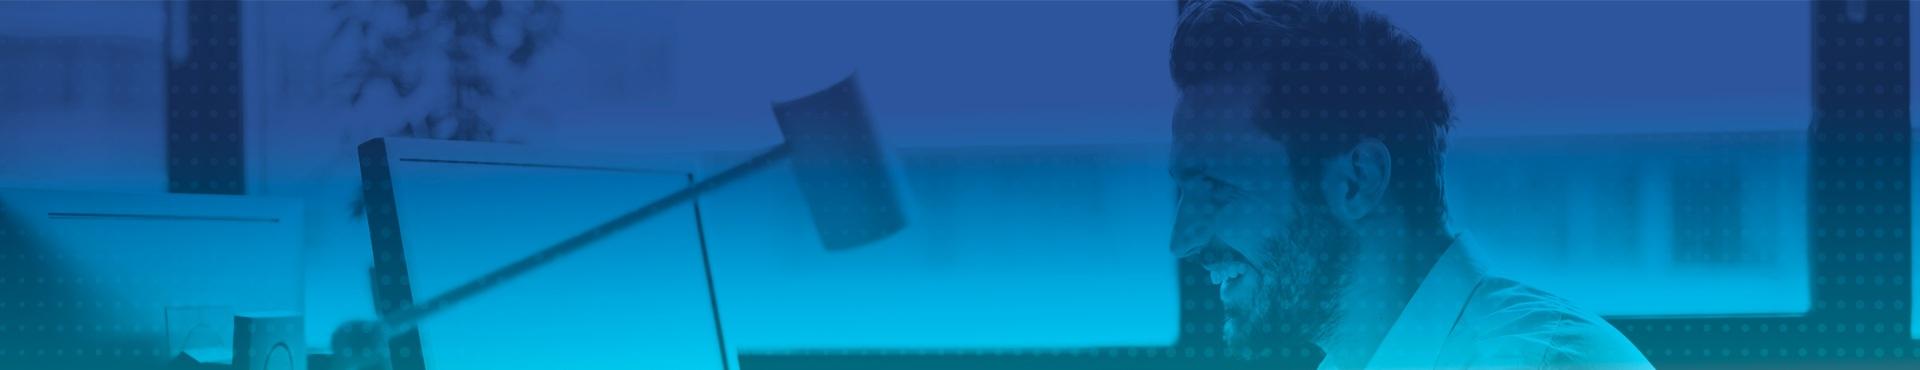 Mailinspector: Deep Integration com Microsoft 365